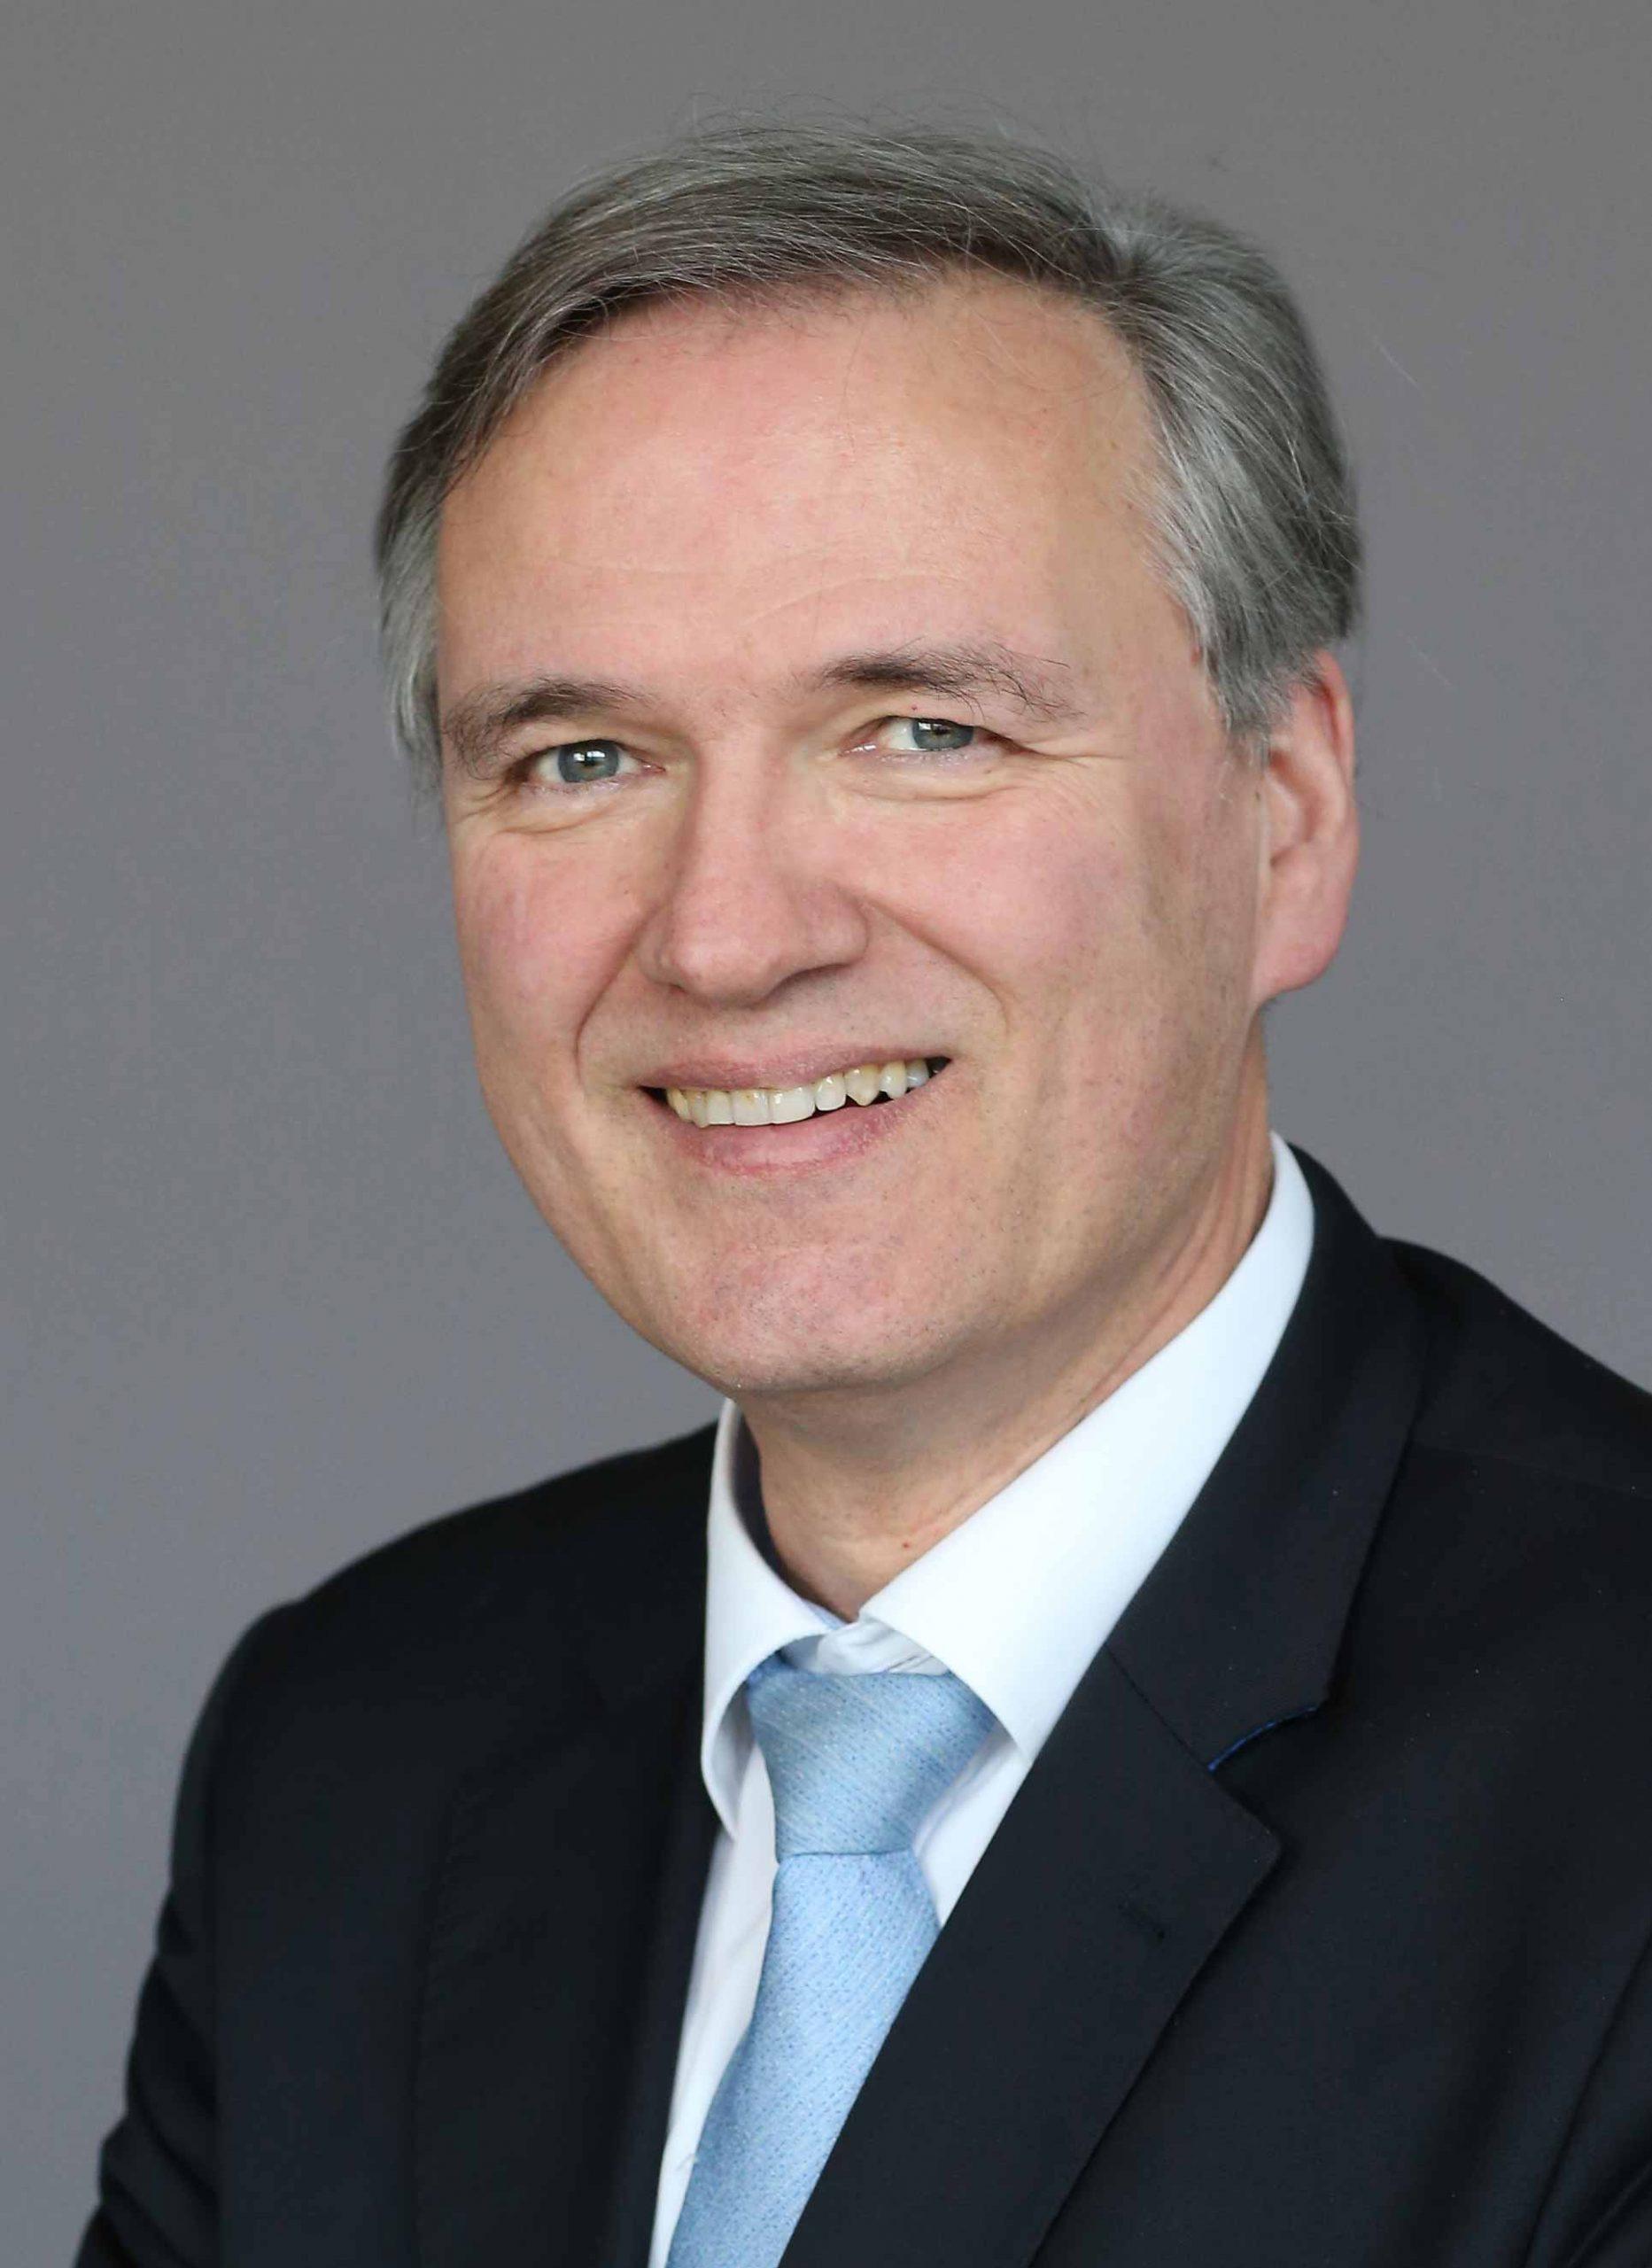 Saarbrücken 2018 © Robertus Koppies